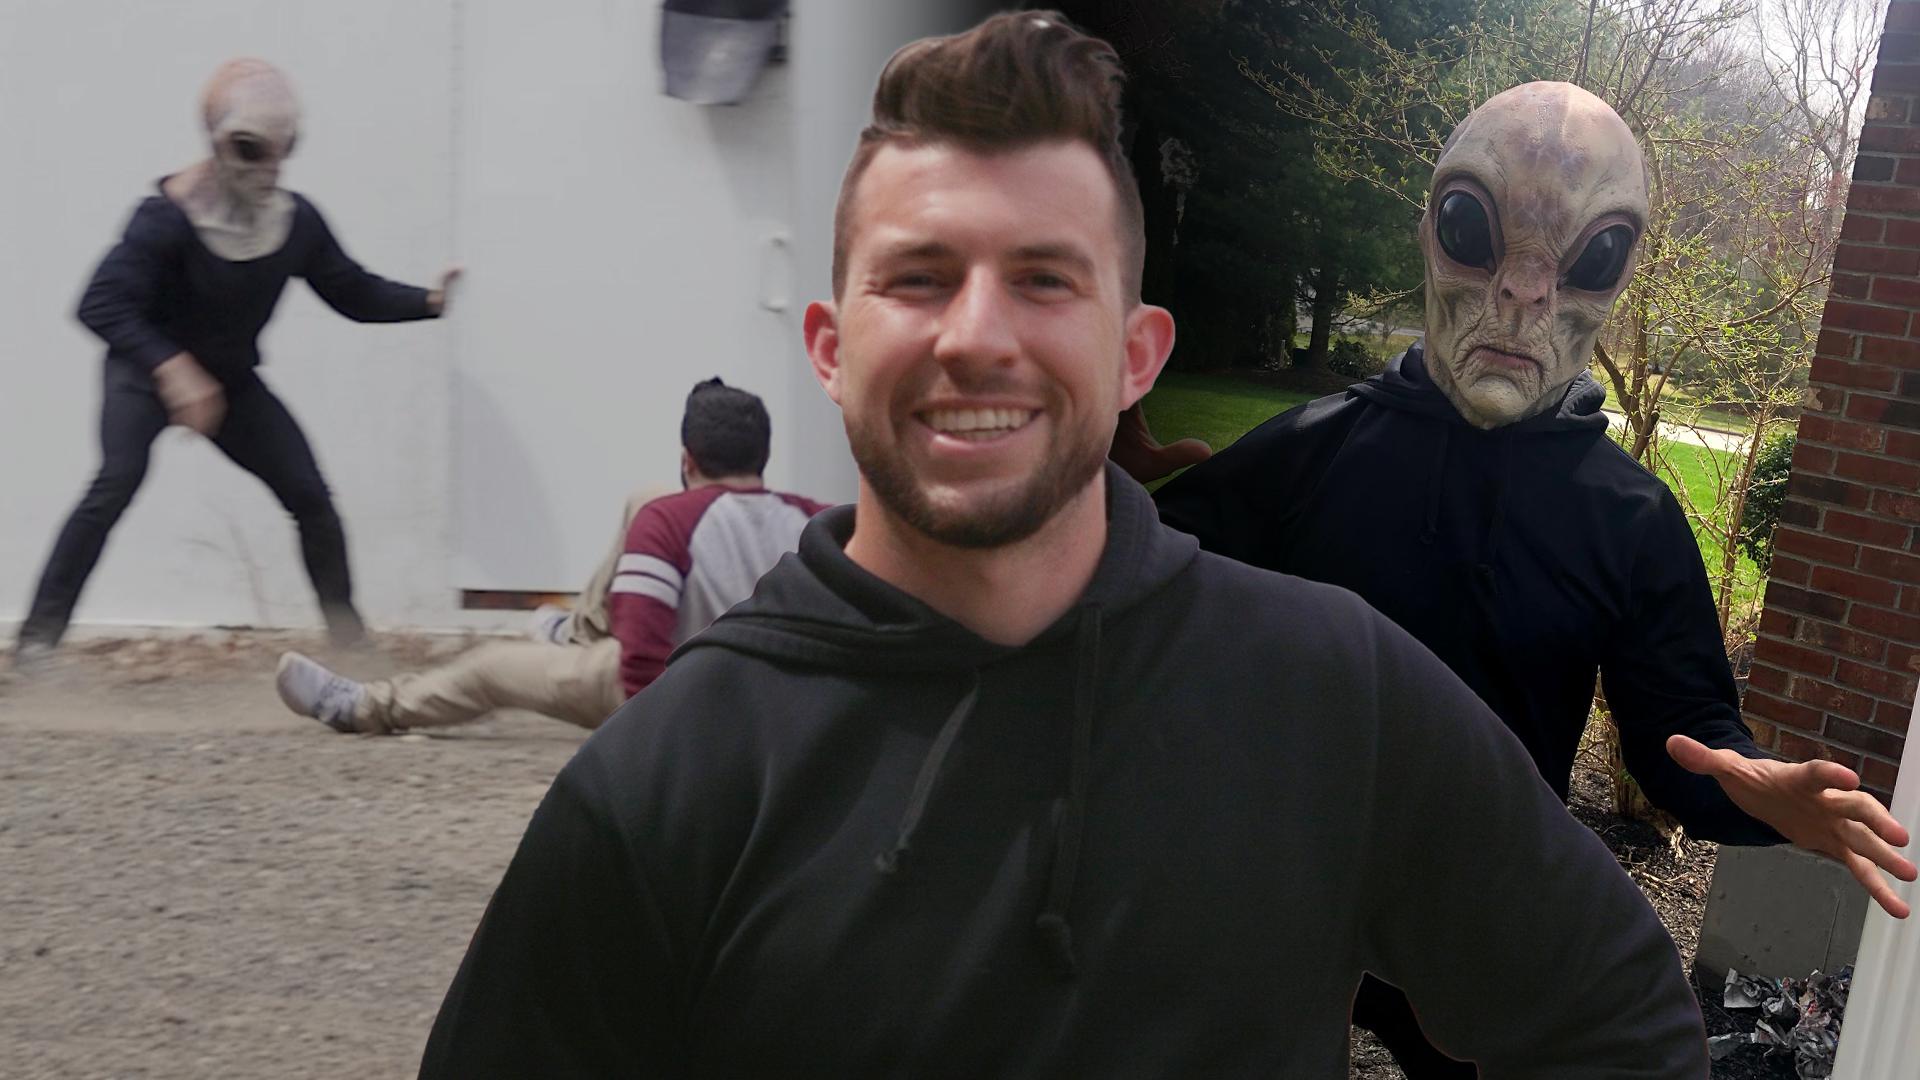 Alex Turgeon in front of alien video scene